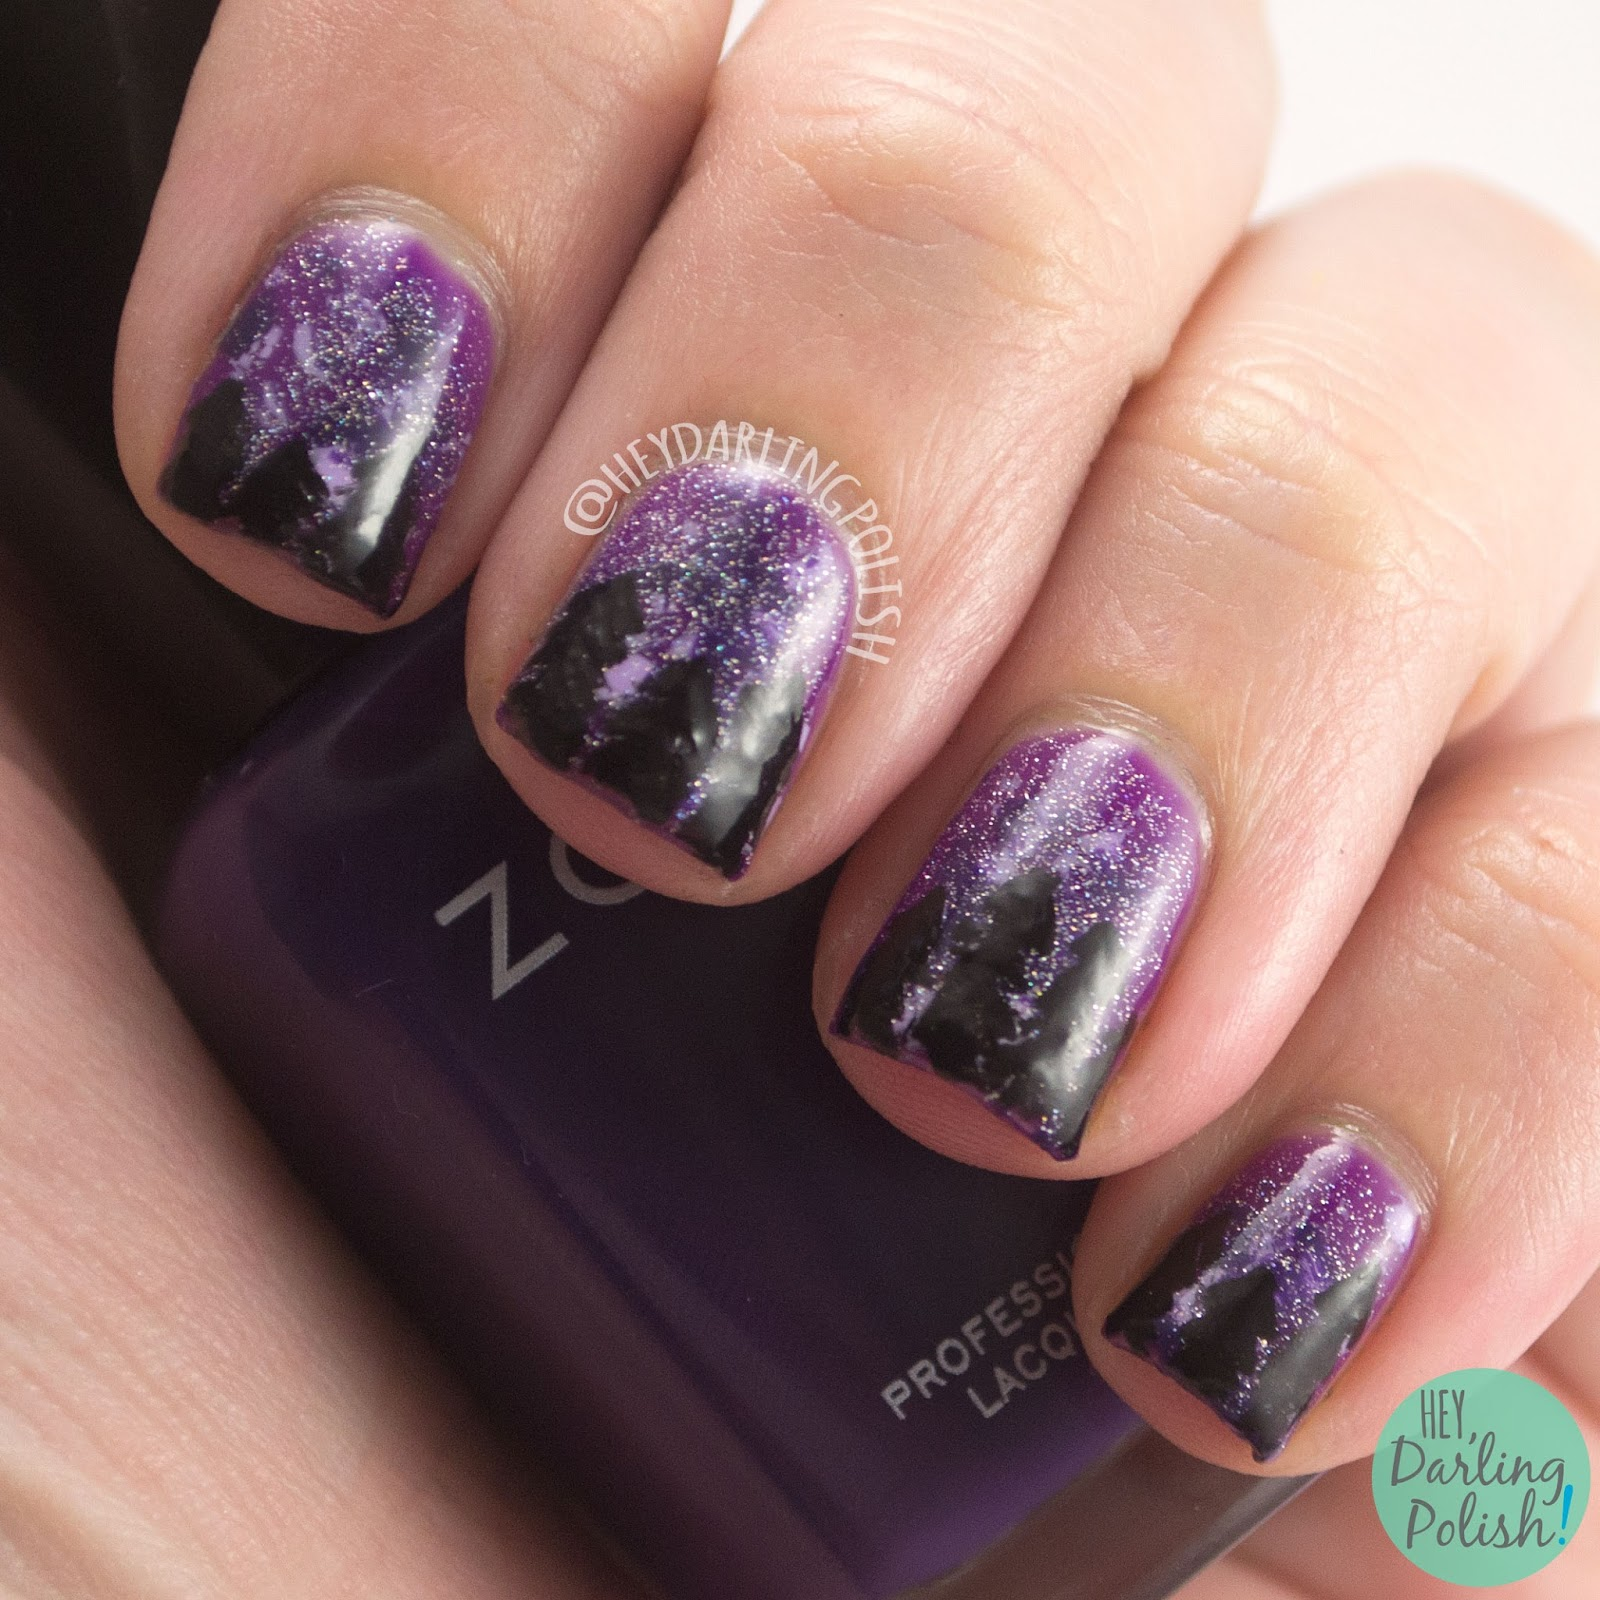 purple, trees, spellbound, spooky, glitter, nails, nail art, nail polish, indie polish, indie, liquid kandi, october sweet treat box, halloween,